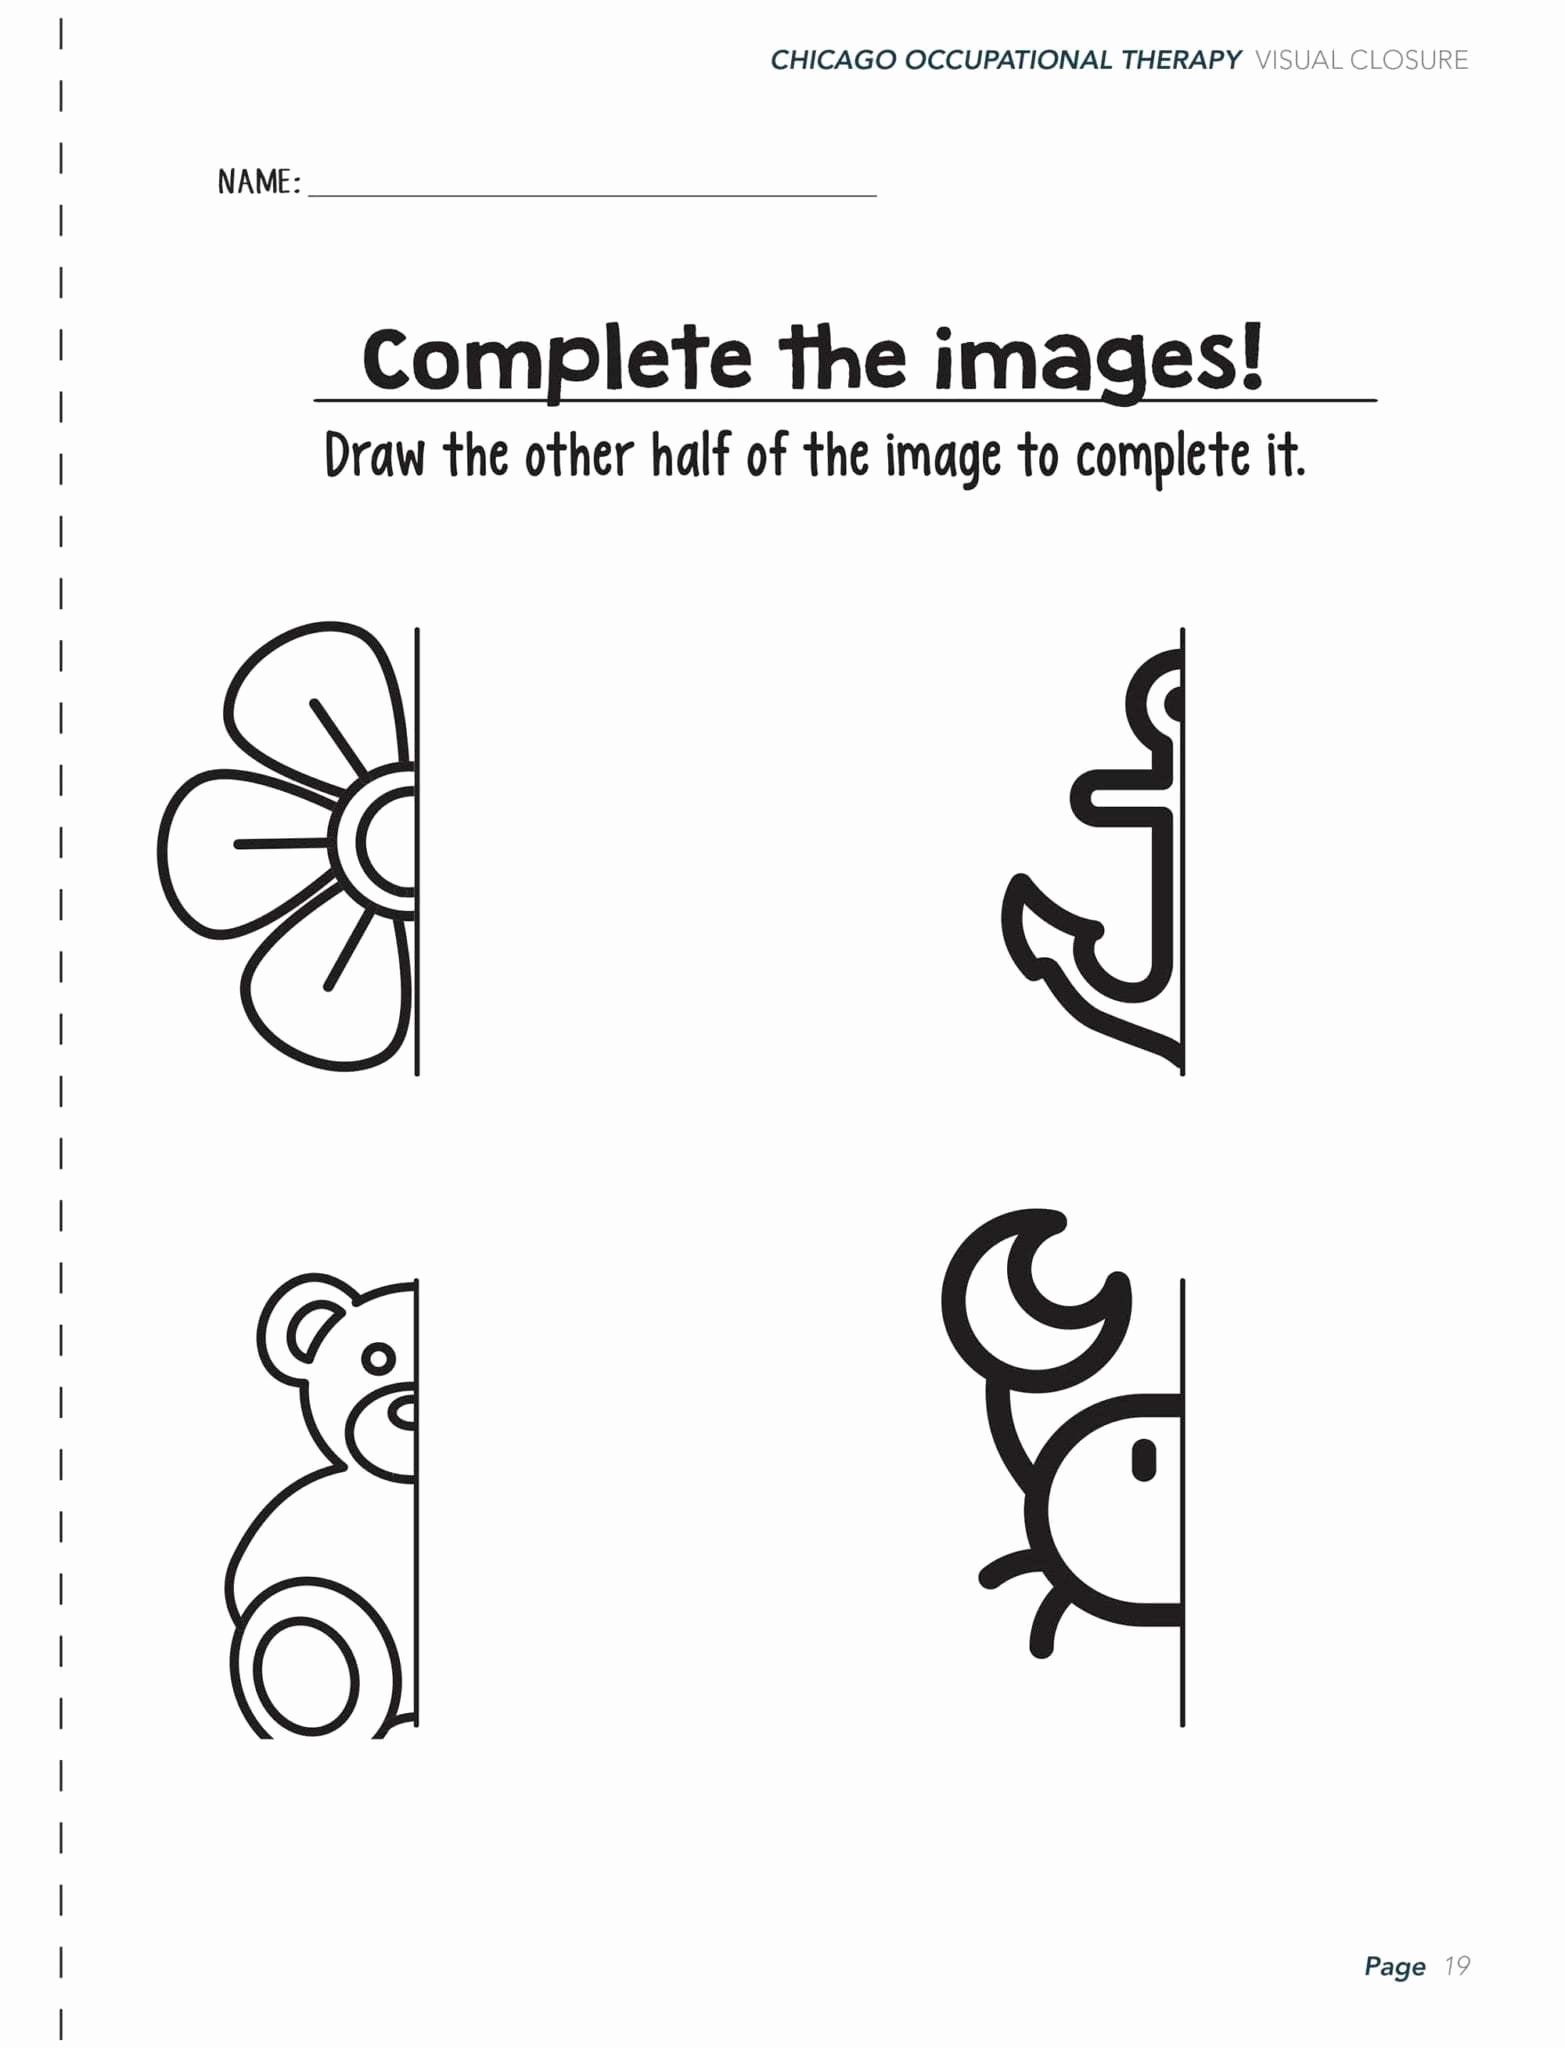 Visual Perception Worksheets for Preschoolers Fresh Visual Perceptual Worksheets Printable and Activities